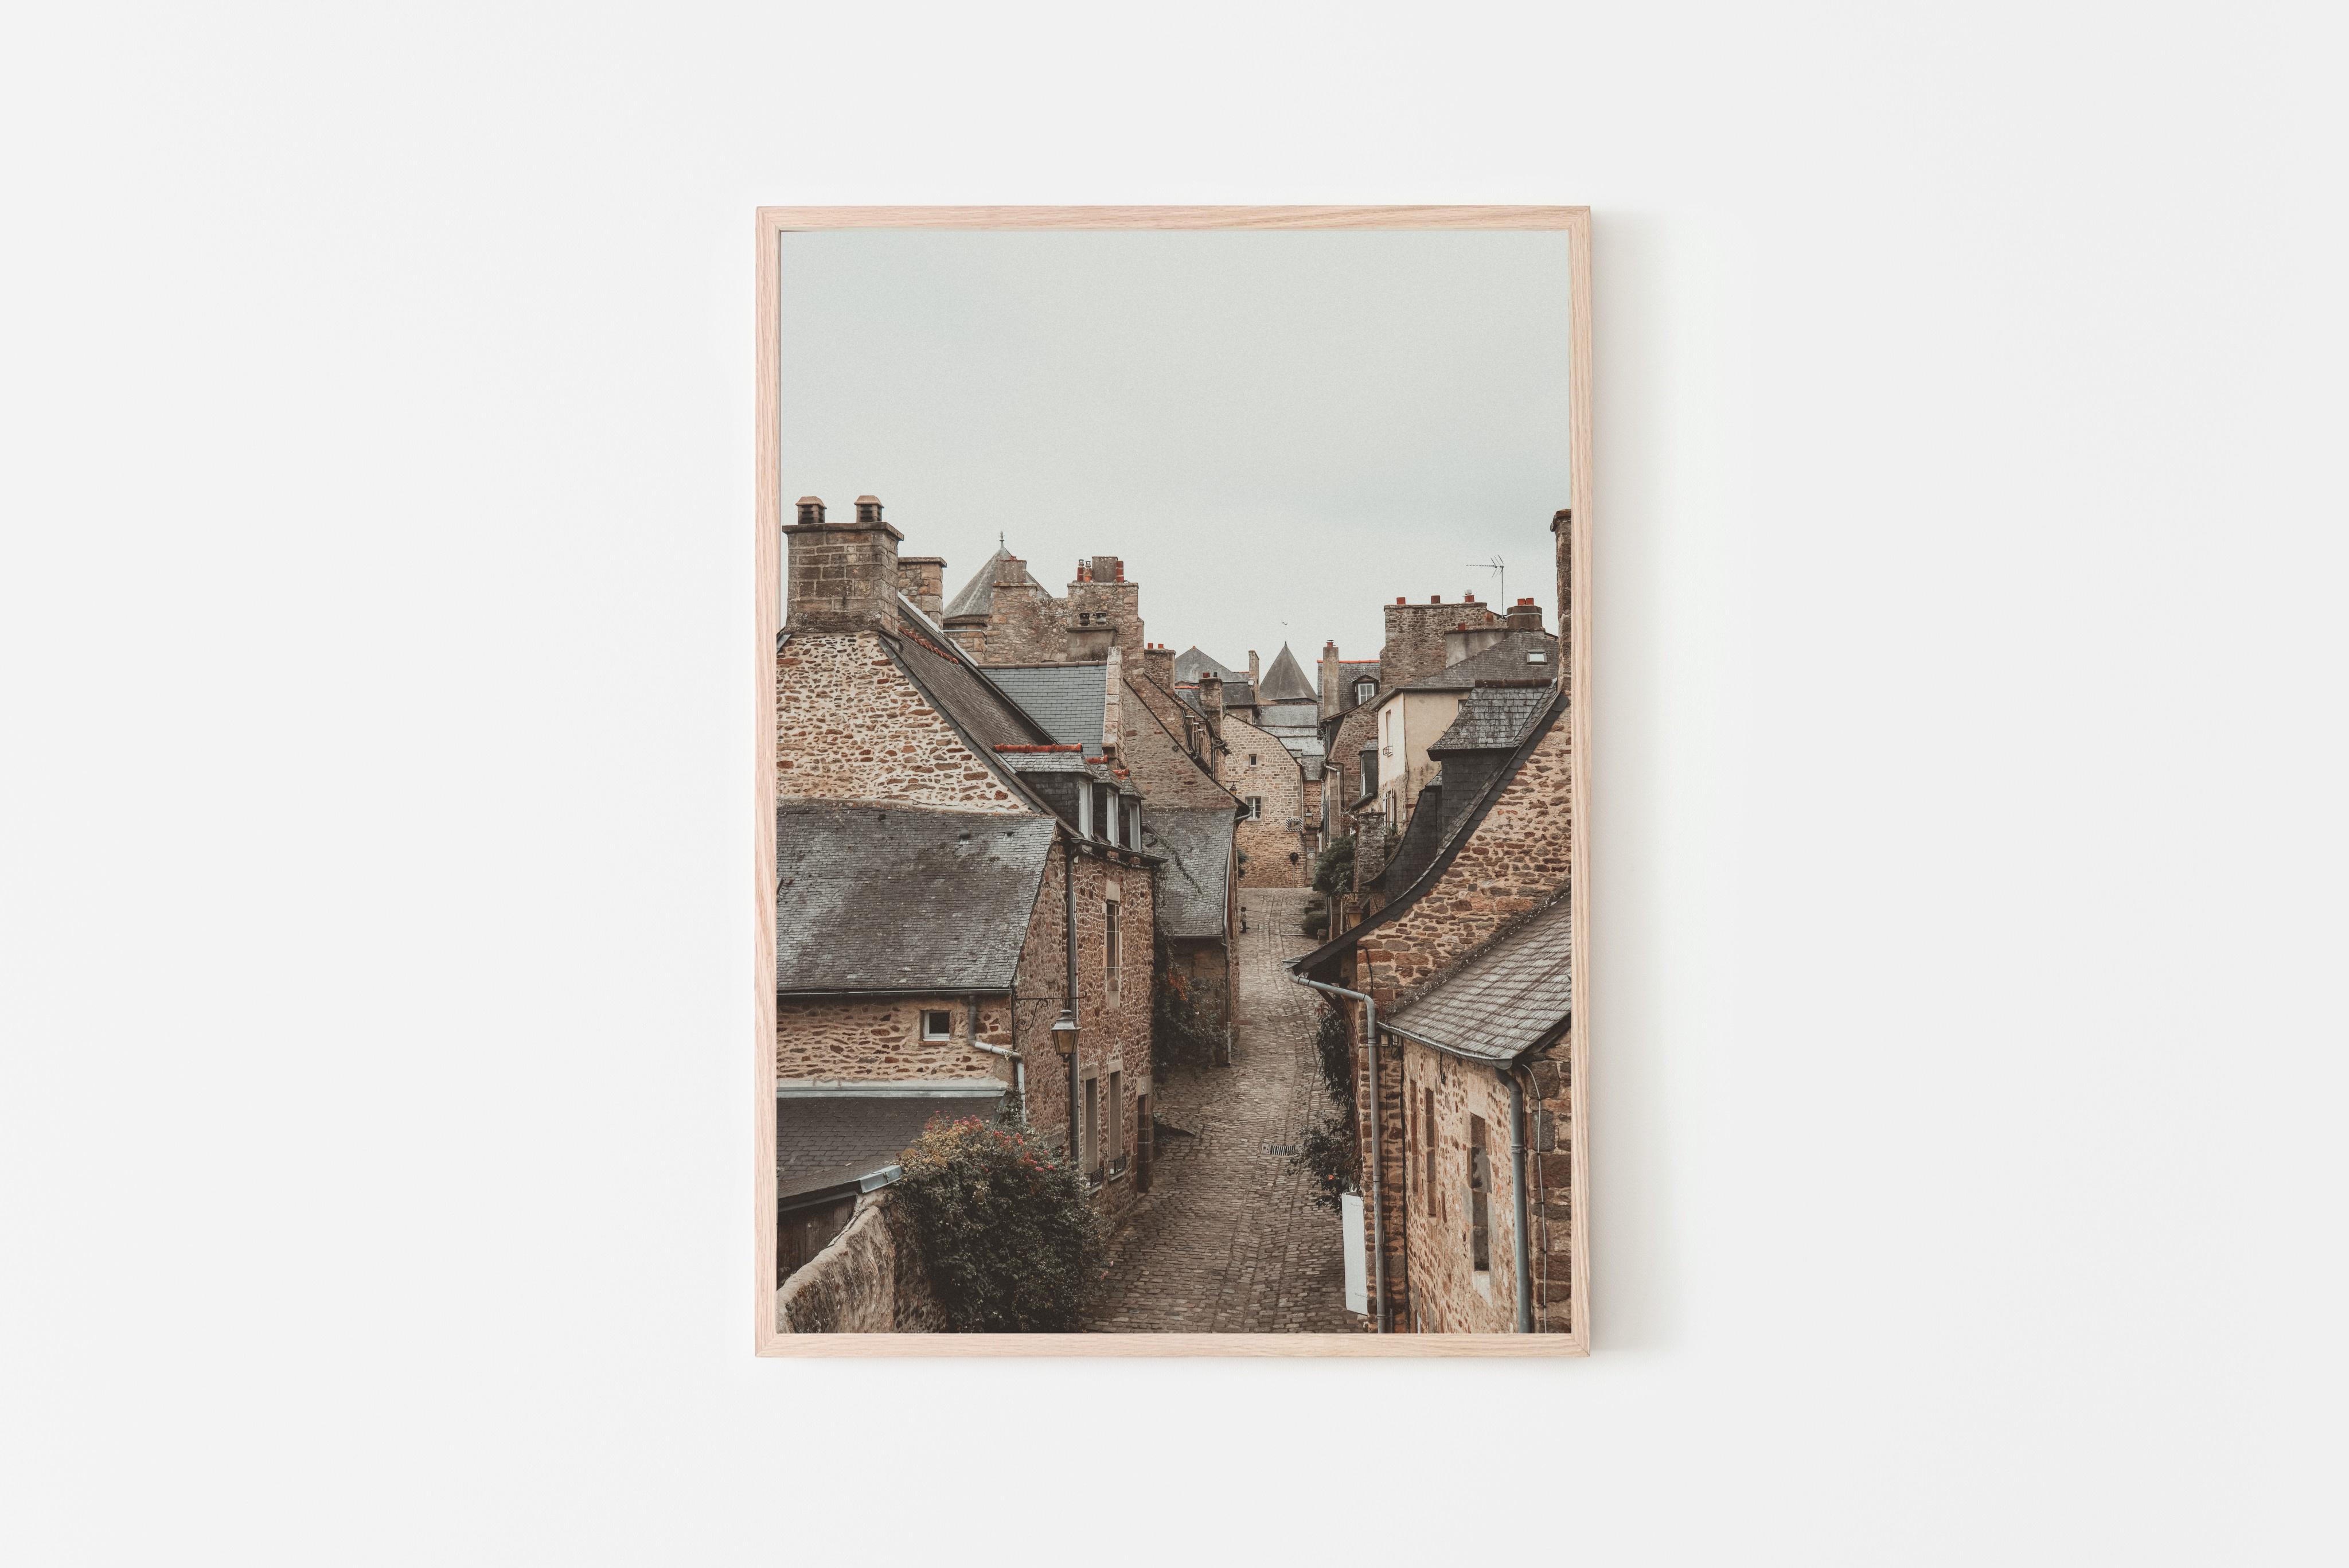 france small village wall print